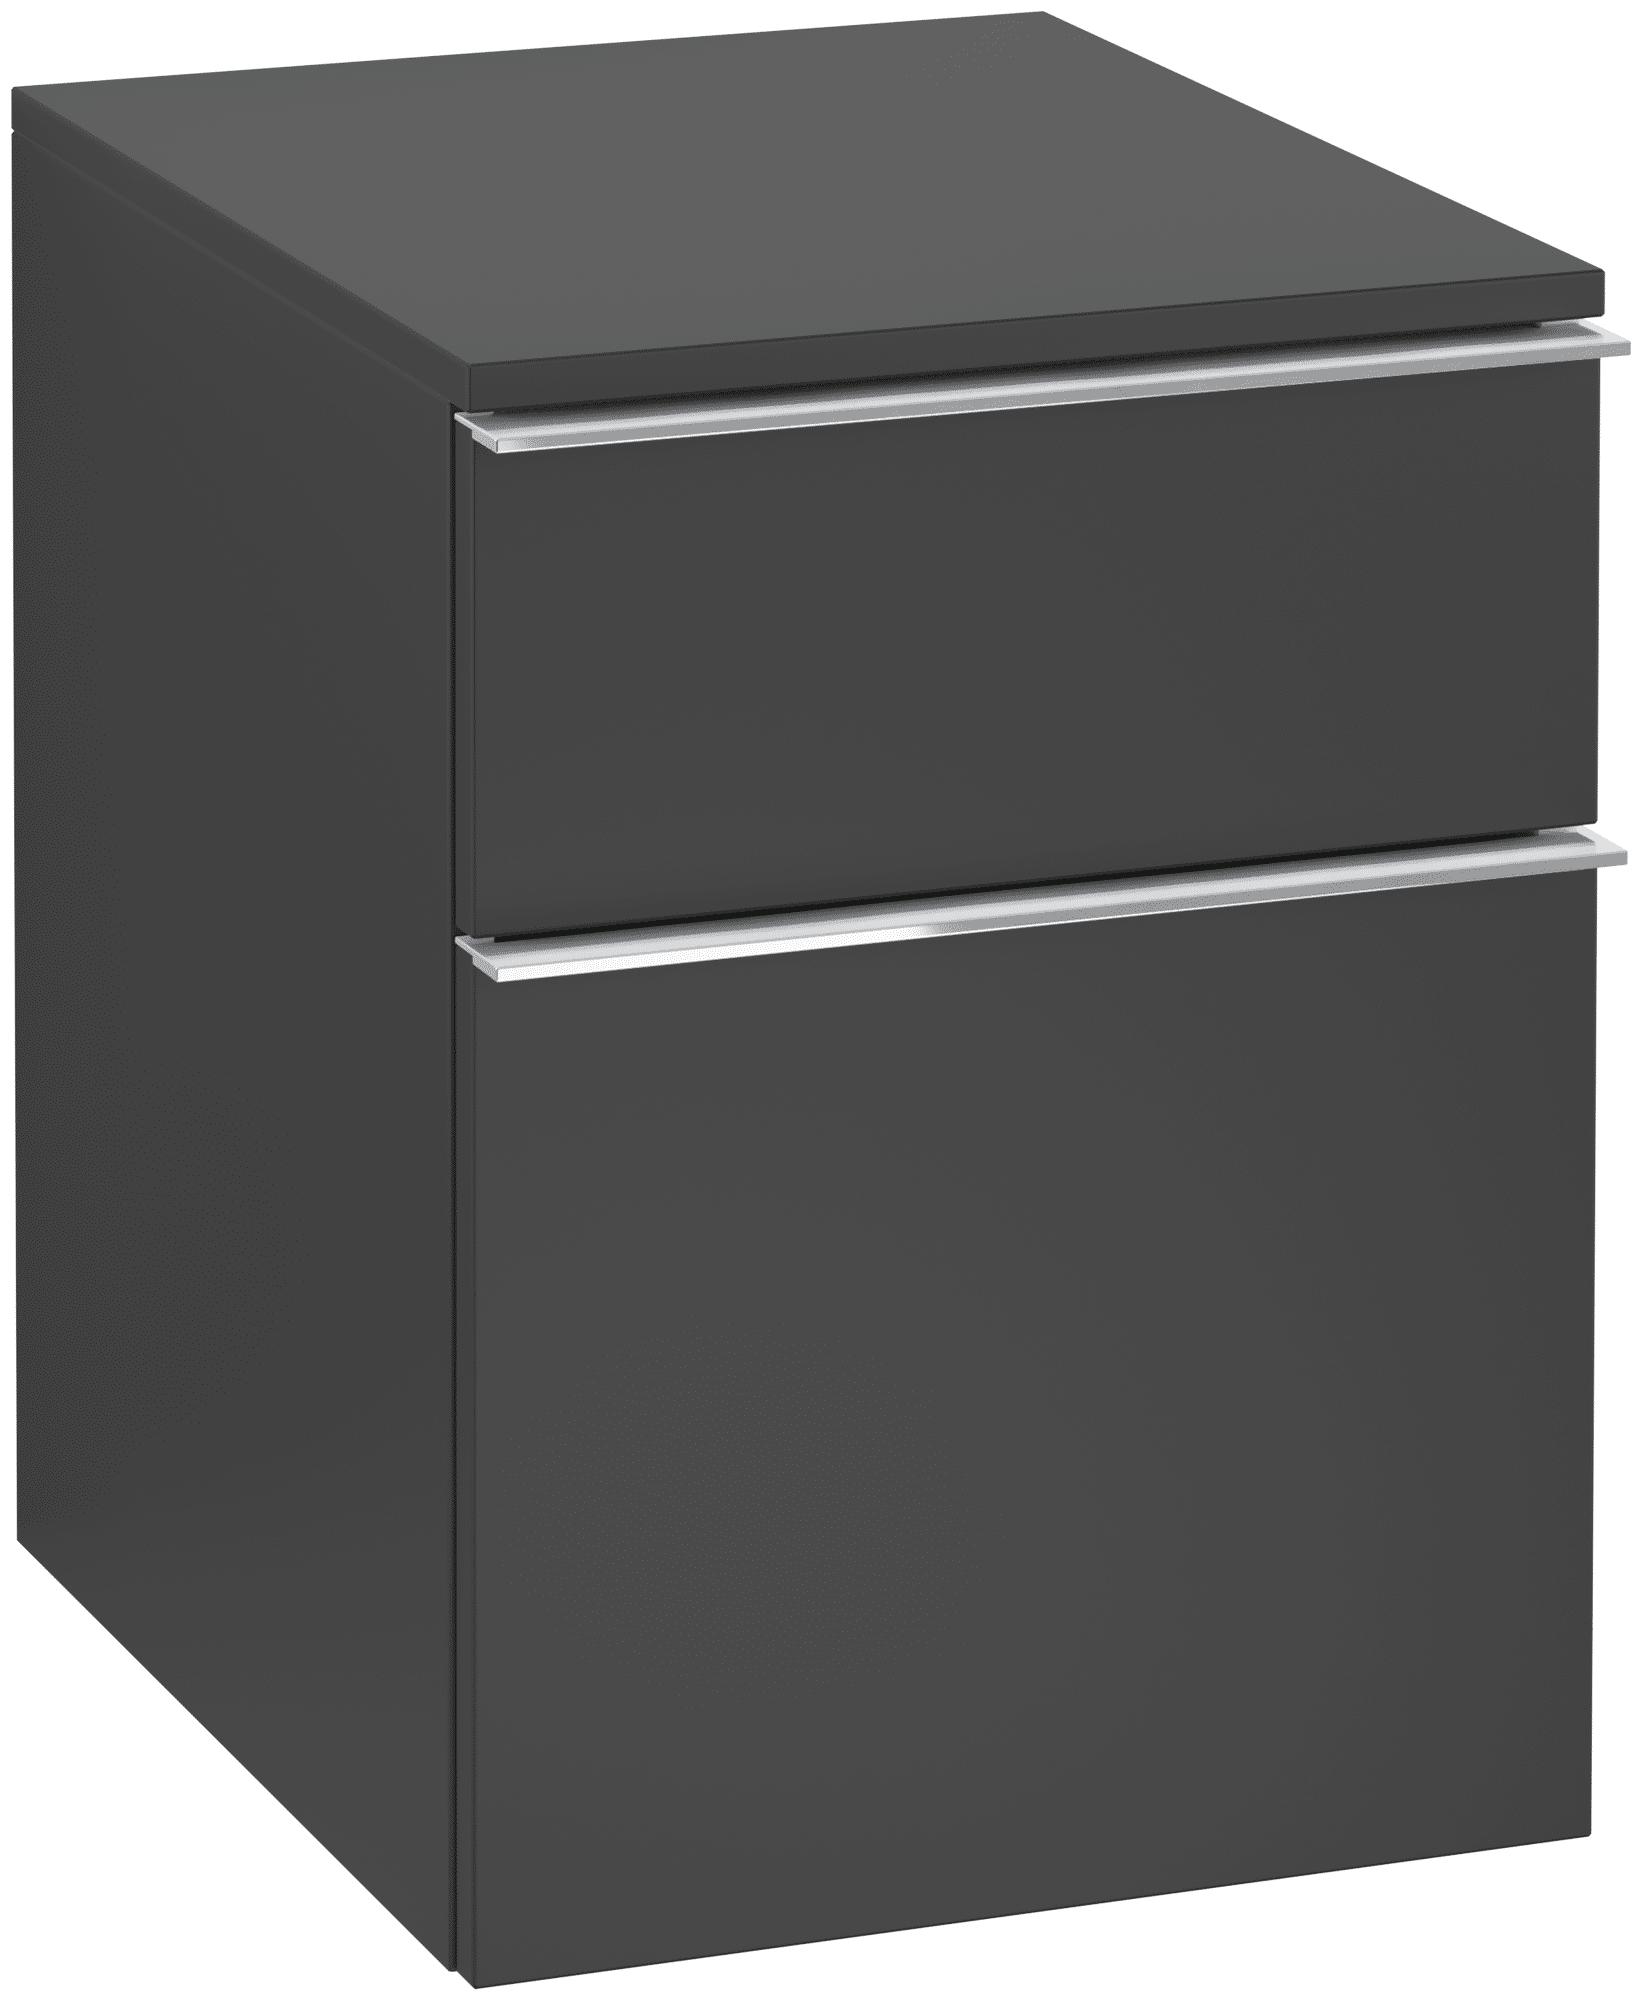 Villeroy & Boch Villeroy & Boch Venticello - Anbauschrank A954 404 x 529 x  477 mm Griff chrome black matt lacquer